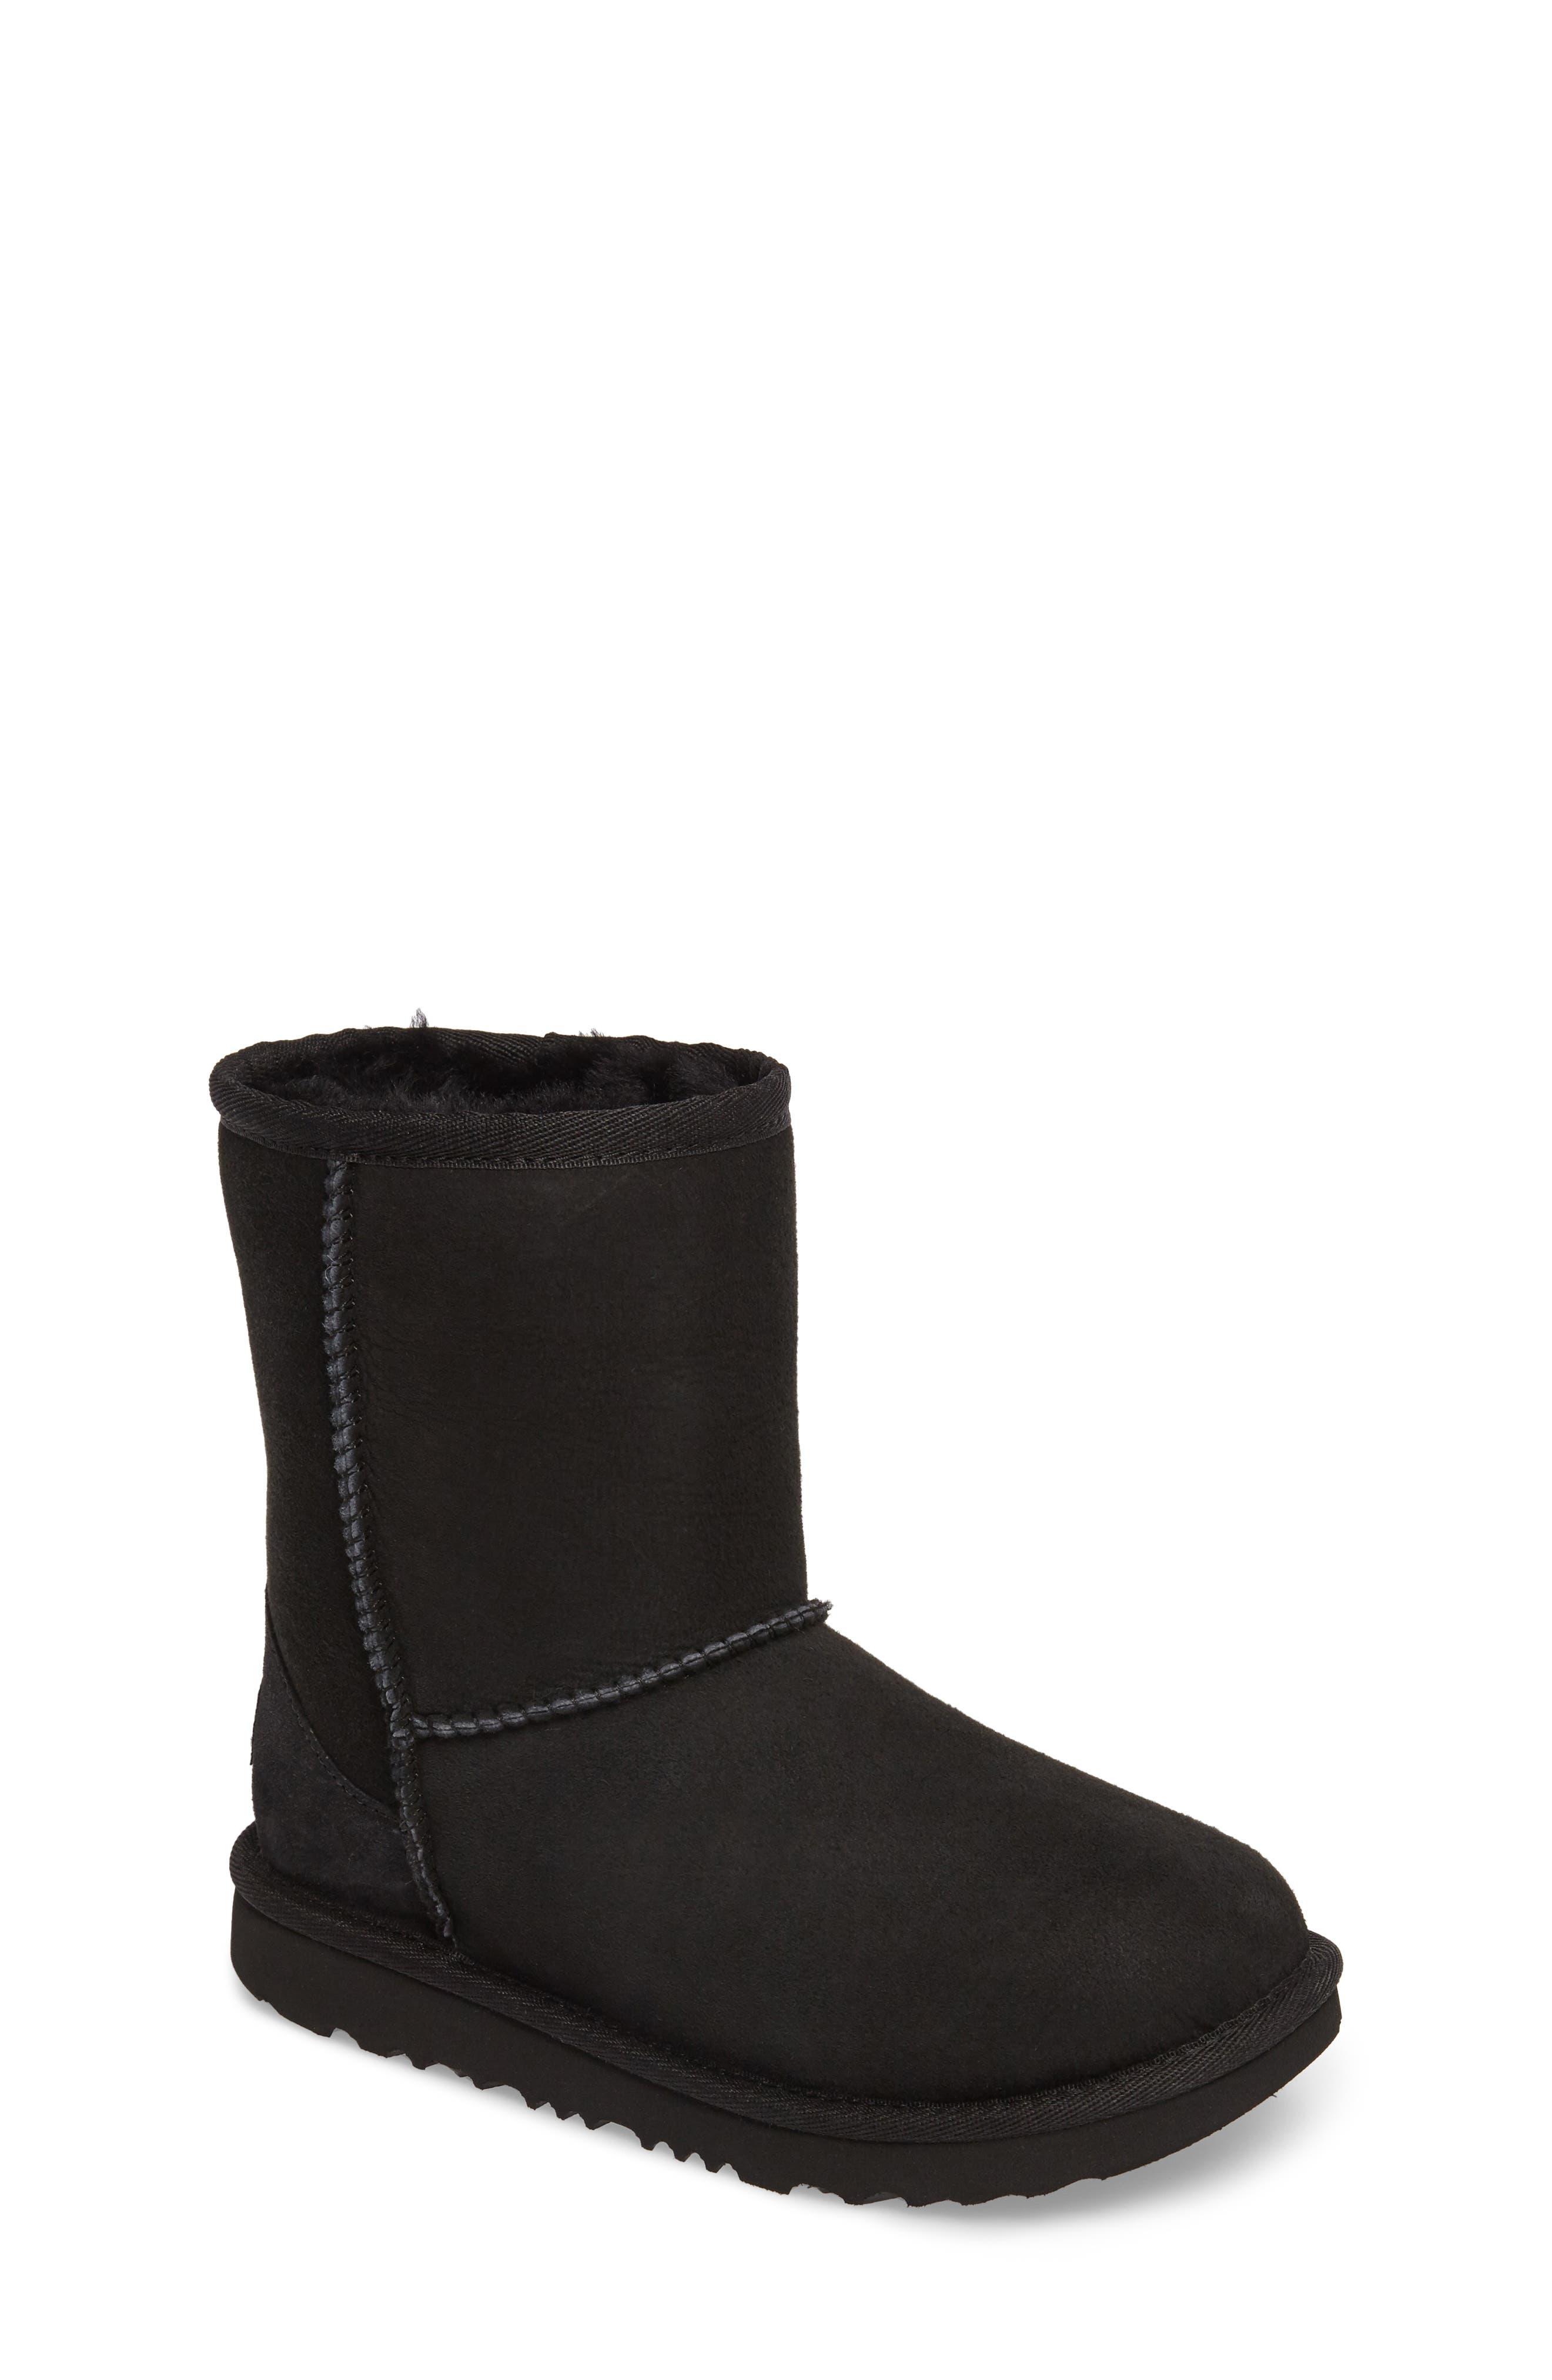 Classic Short II Water Resistant Genuine Shearling Boot,                             Main thumbnail 1, color,                             BLACK